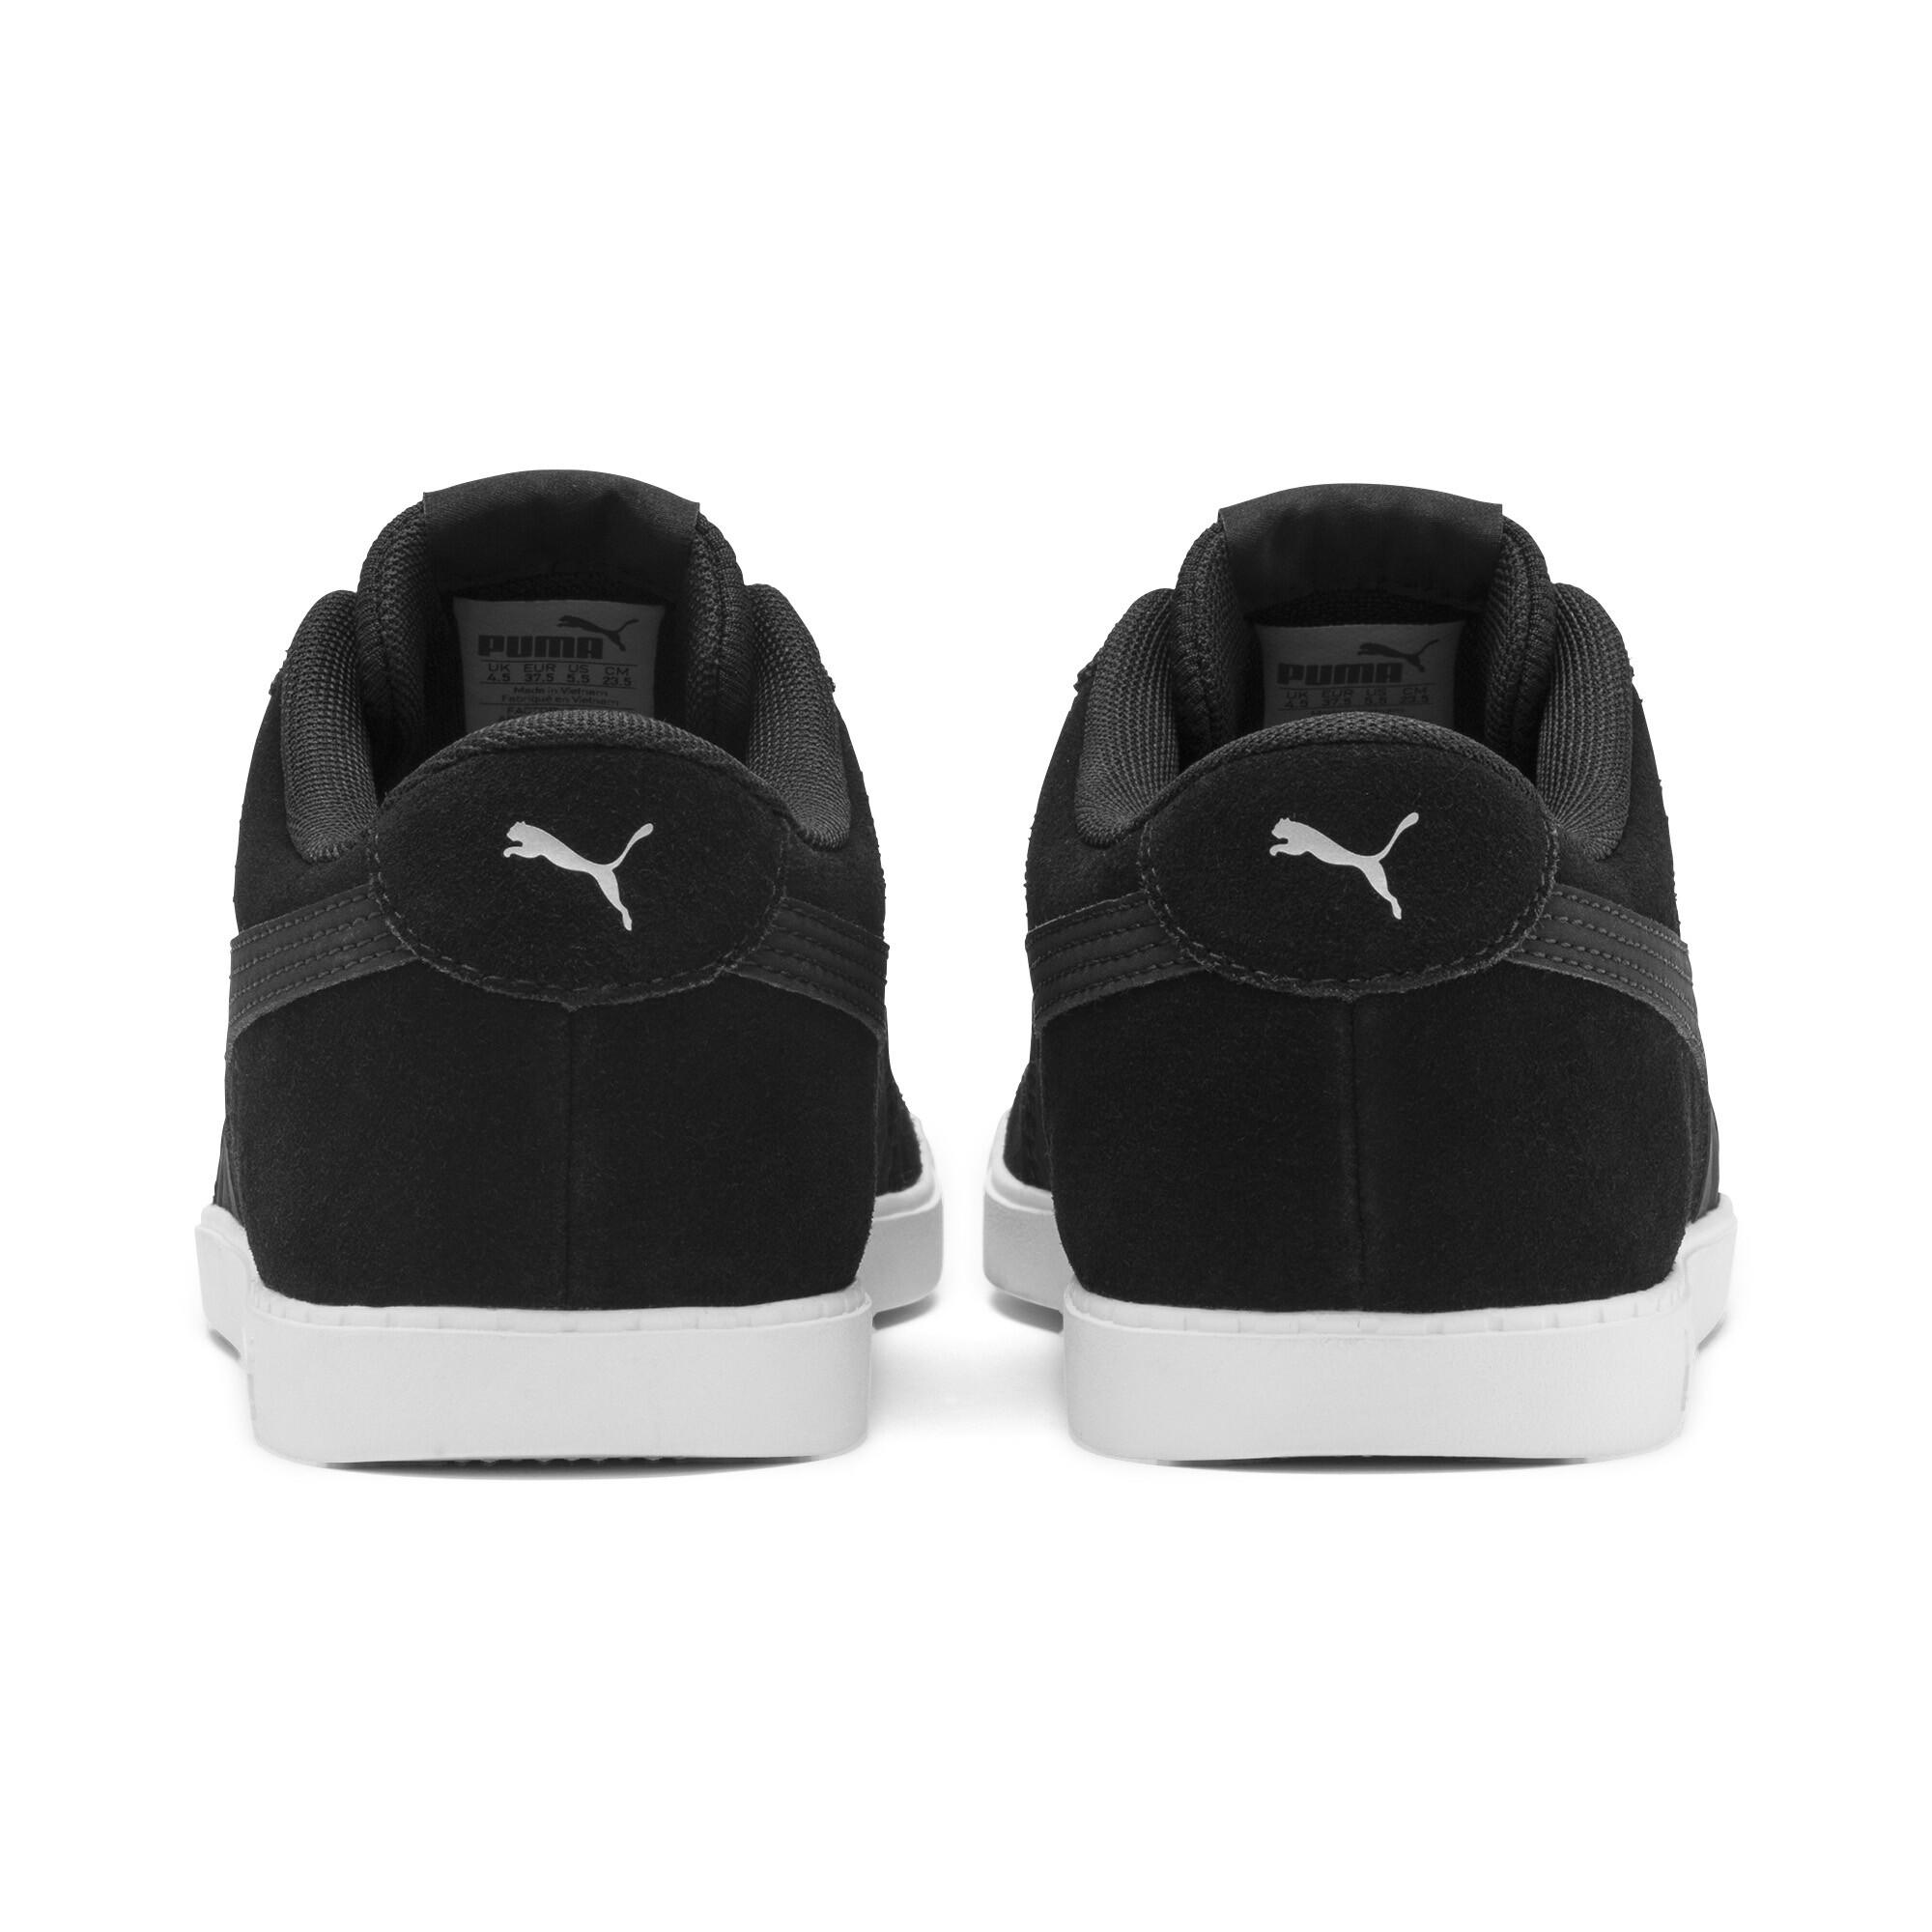 PUMA-Women-039-s-Carina-Slim-Suede-Sneakers thumbnail 17